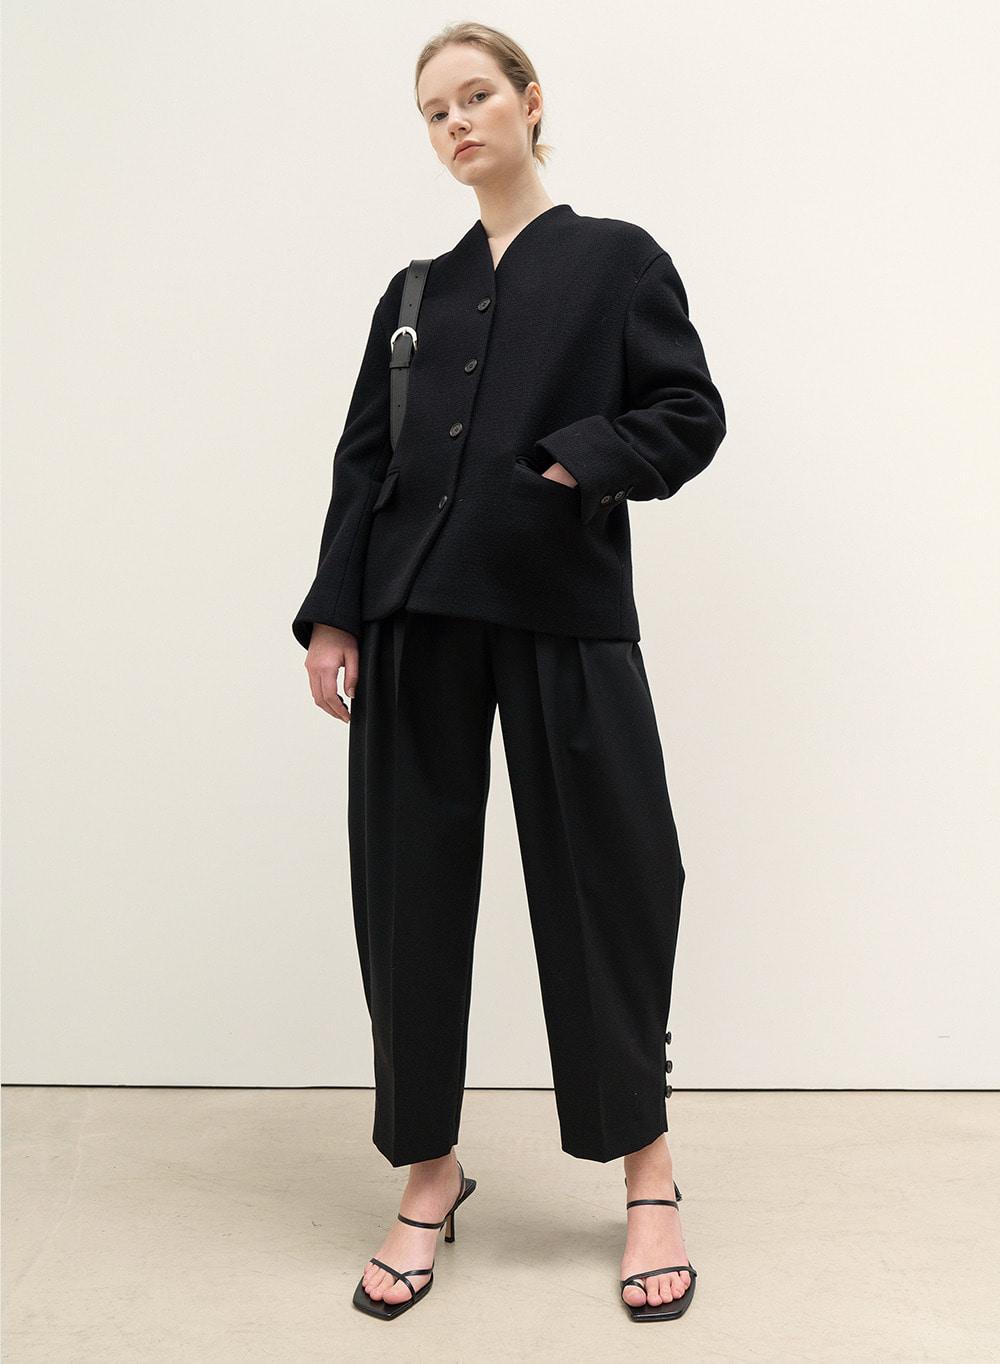 FW20 Rounded Pleats Pants Black